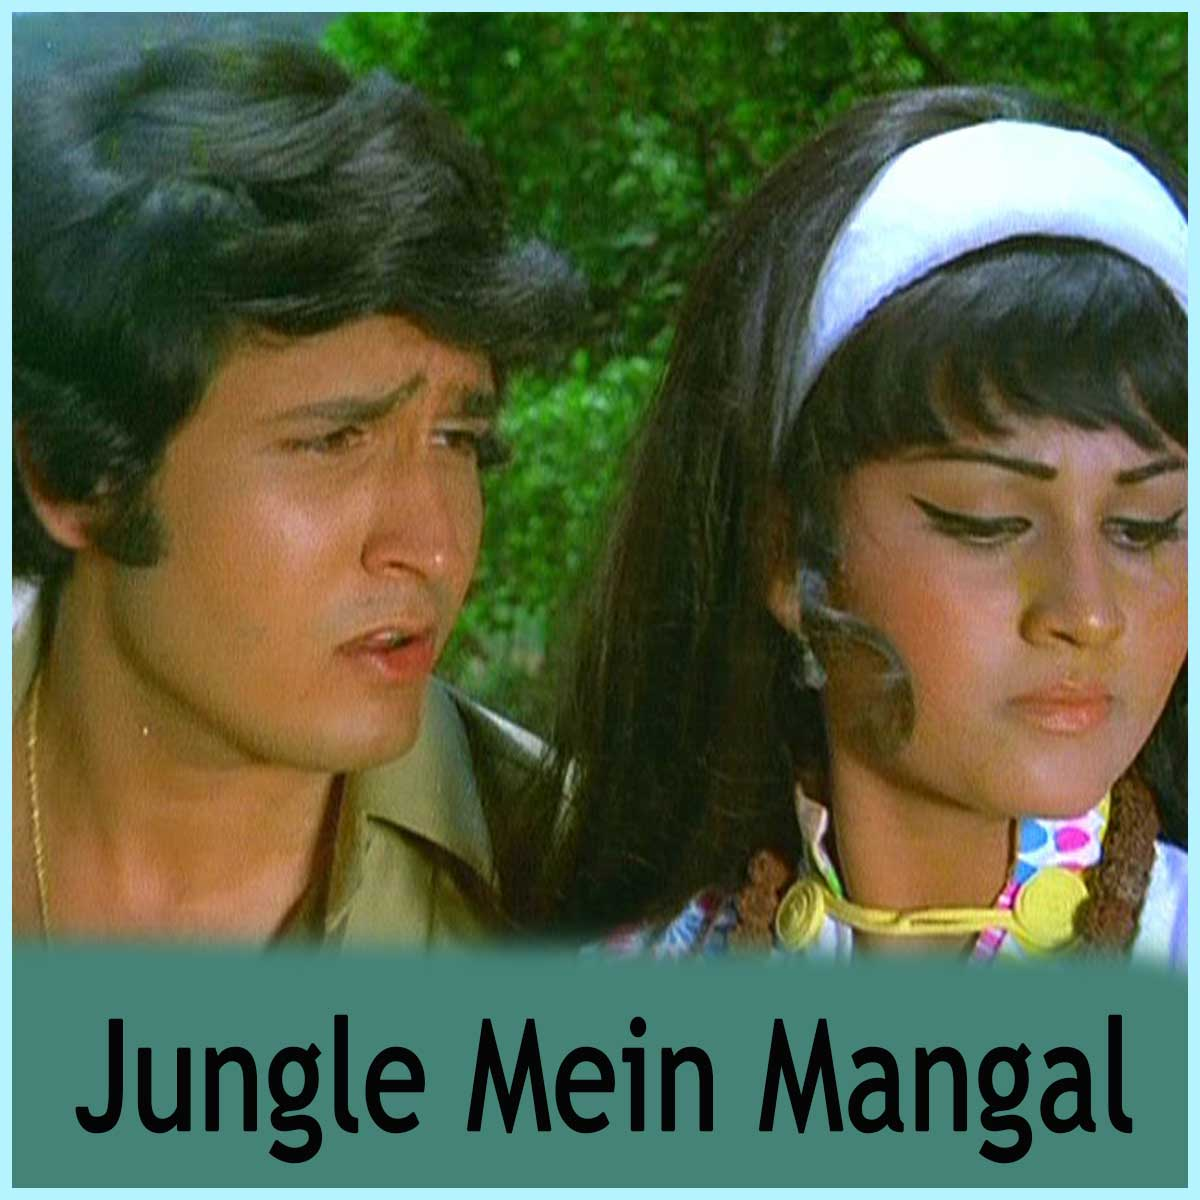 Jungle Mein Mangal Image